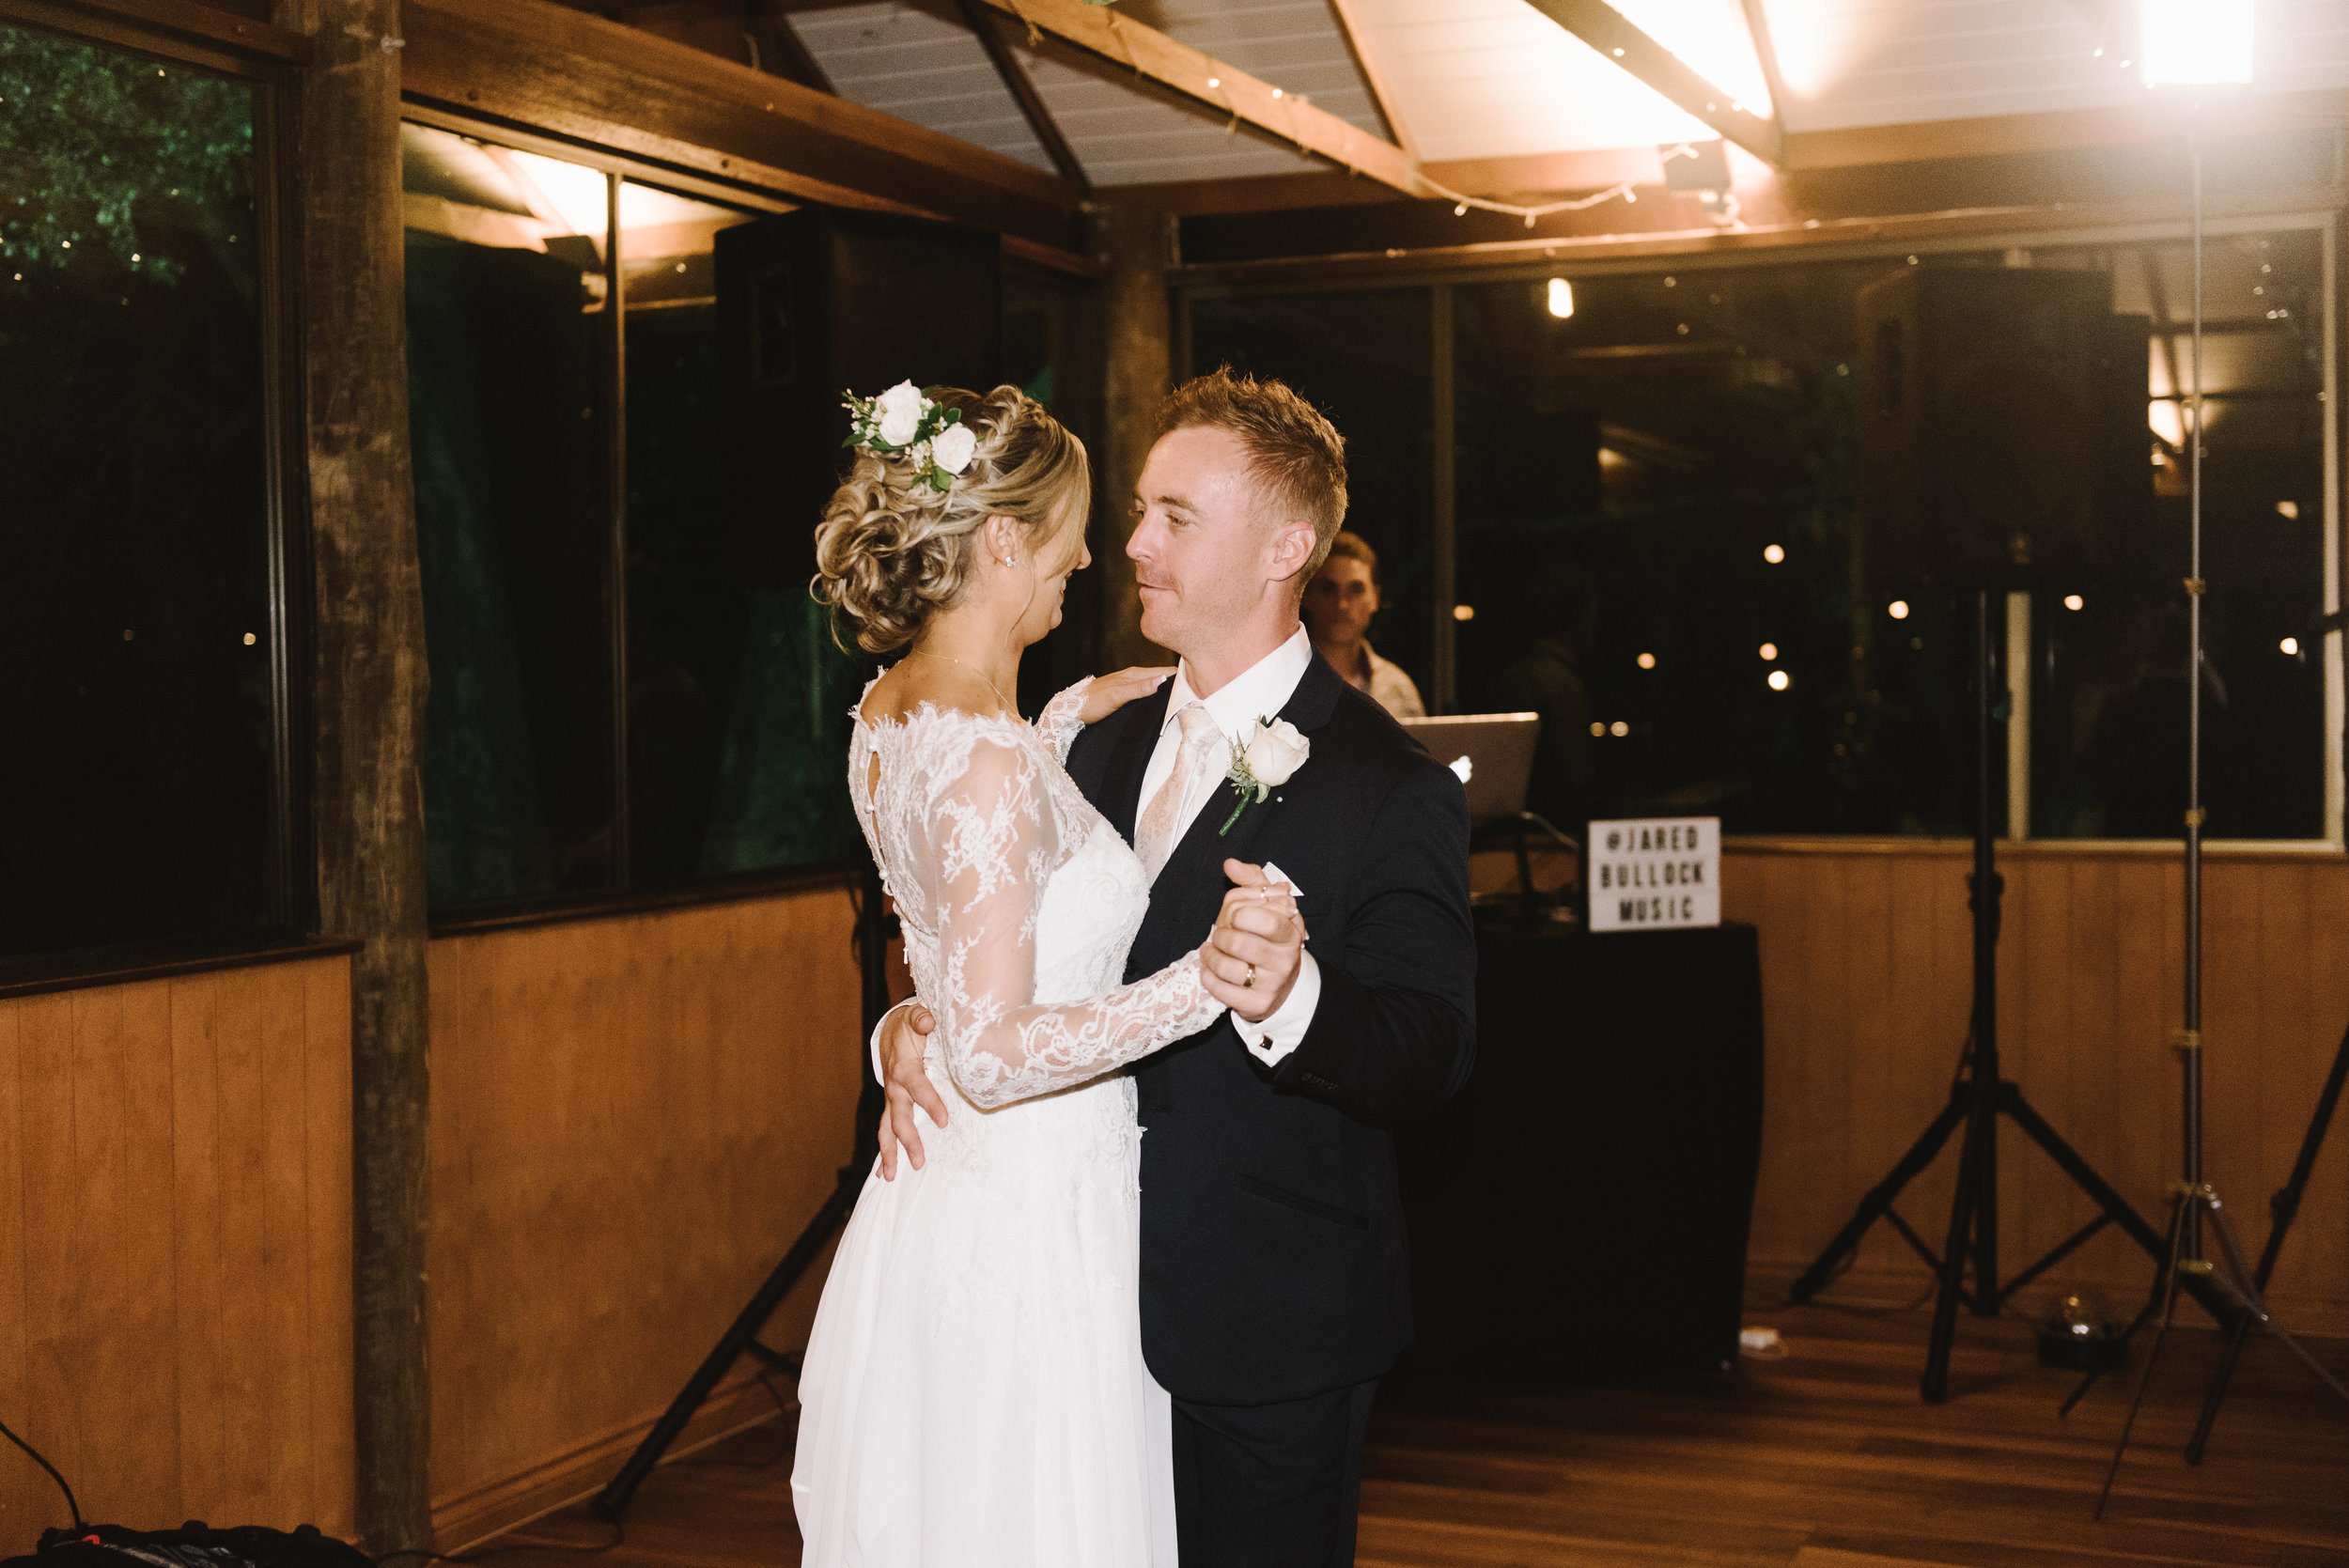 brisbane-gold-coast-sunshine-coast-romantic-wedding-photographer-98.jpg